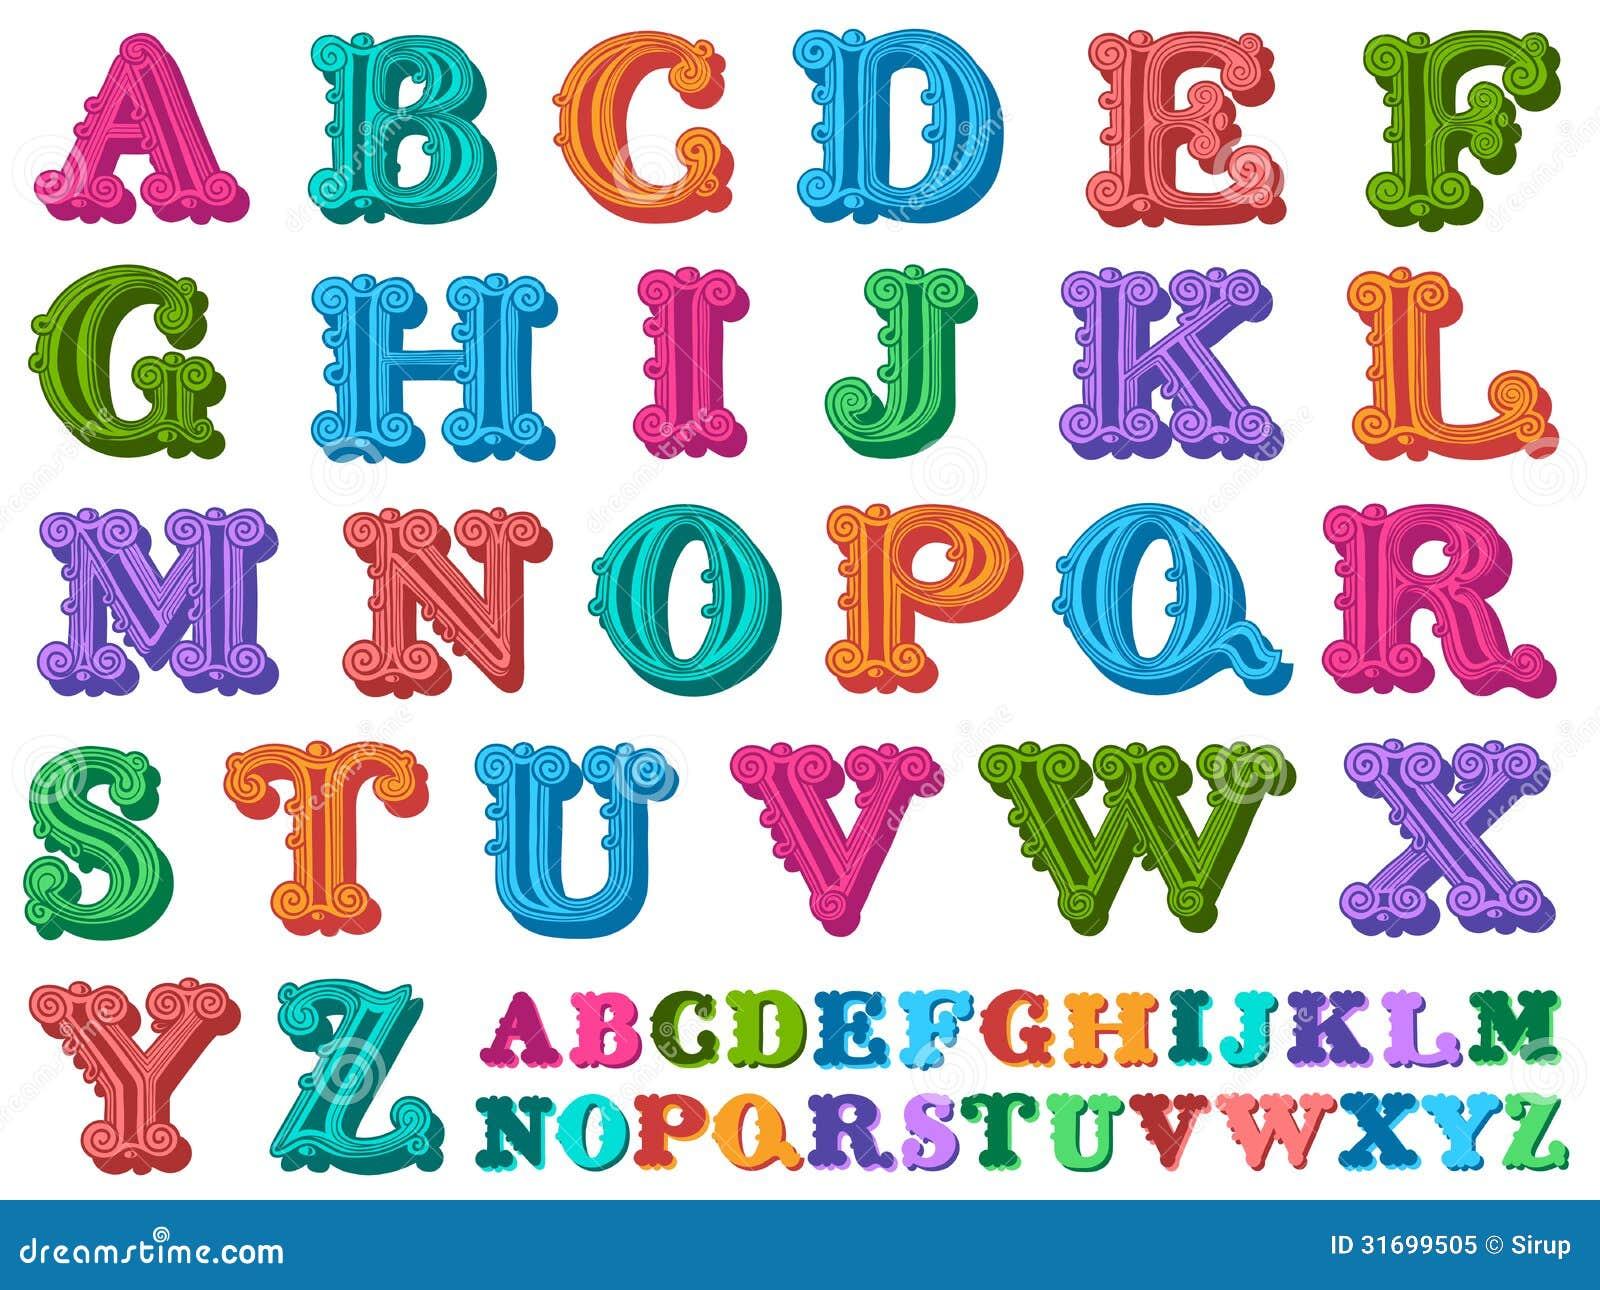 vector illustration of a complete antiqua alphabet royalty alphabet block clip art for christmas alphabet blocks clipart letters